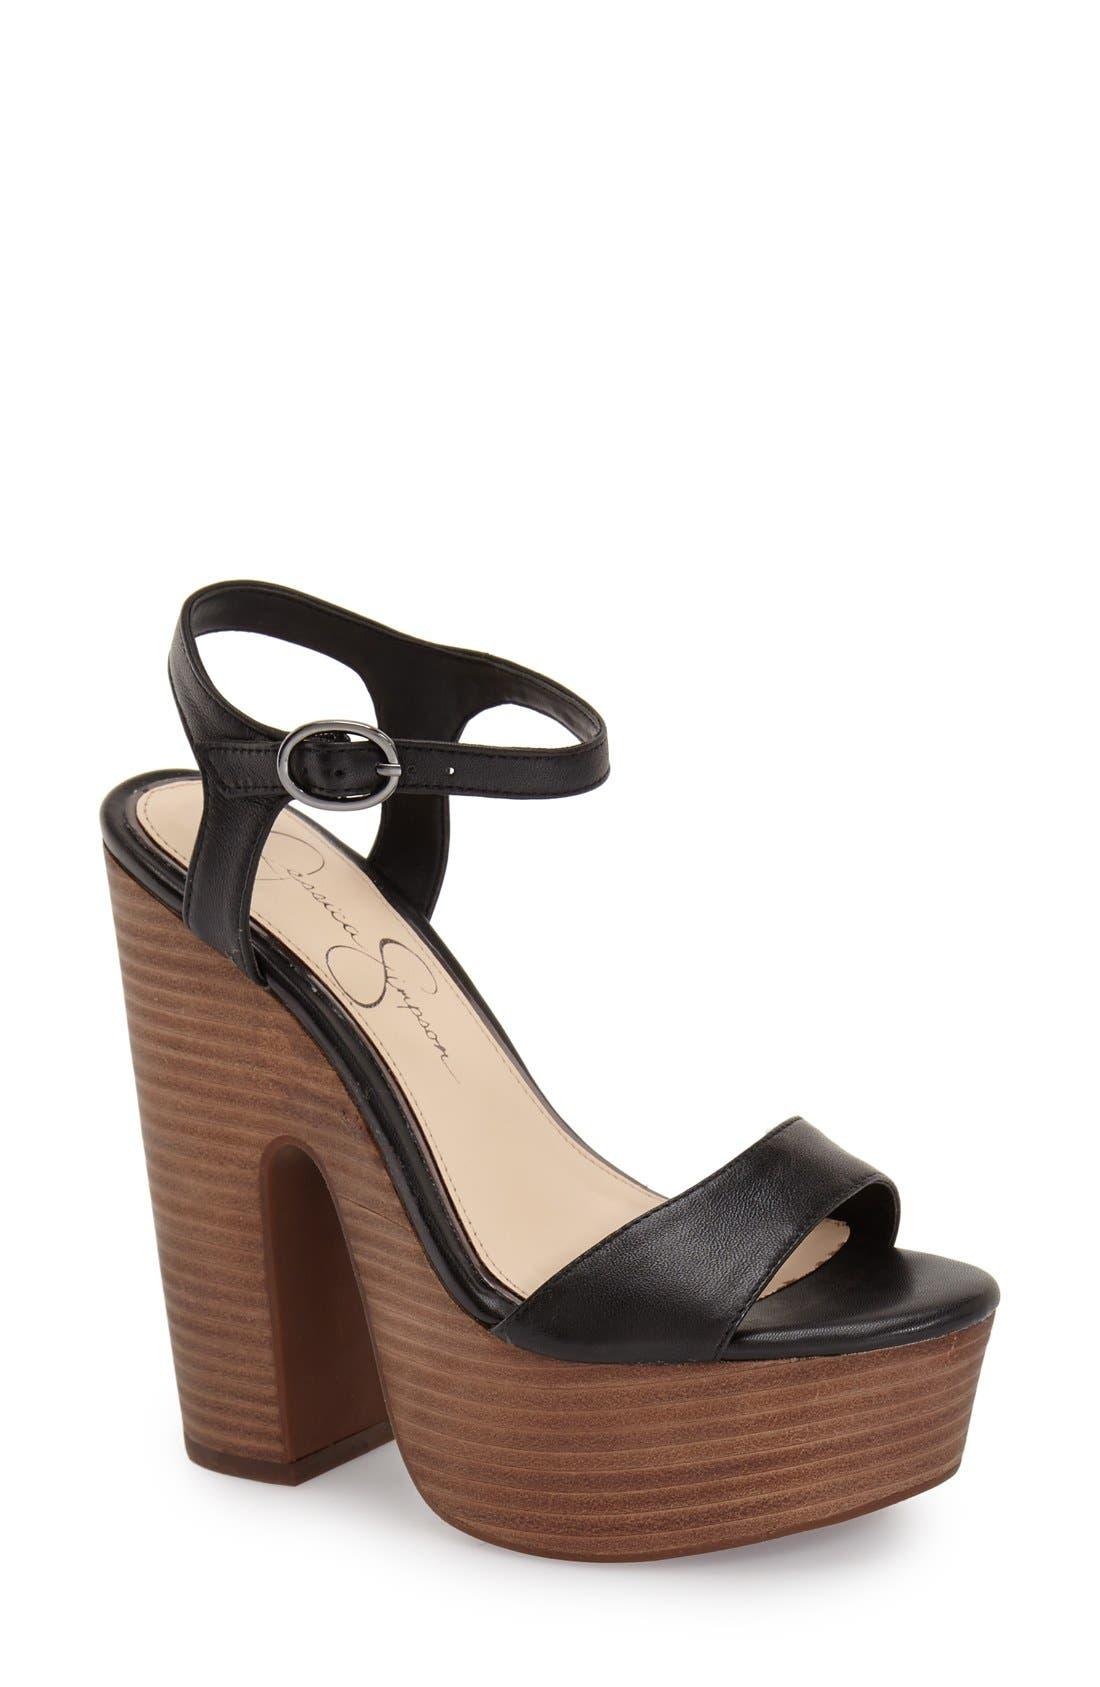 Main Image - Jessica Simpson 'Whirl' Platform Sandal (Women)